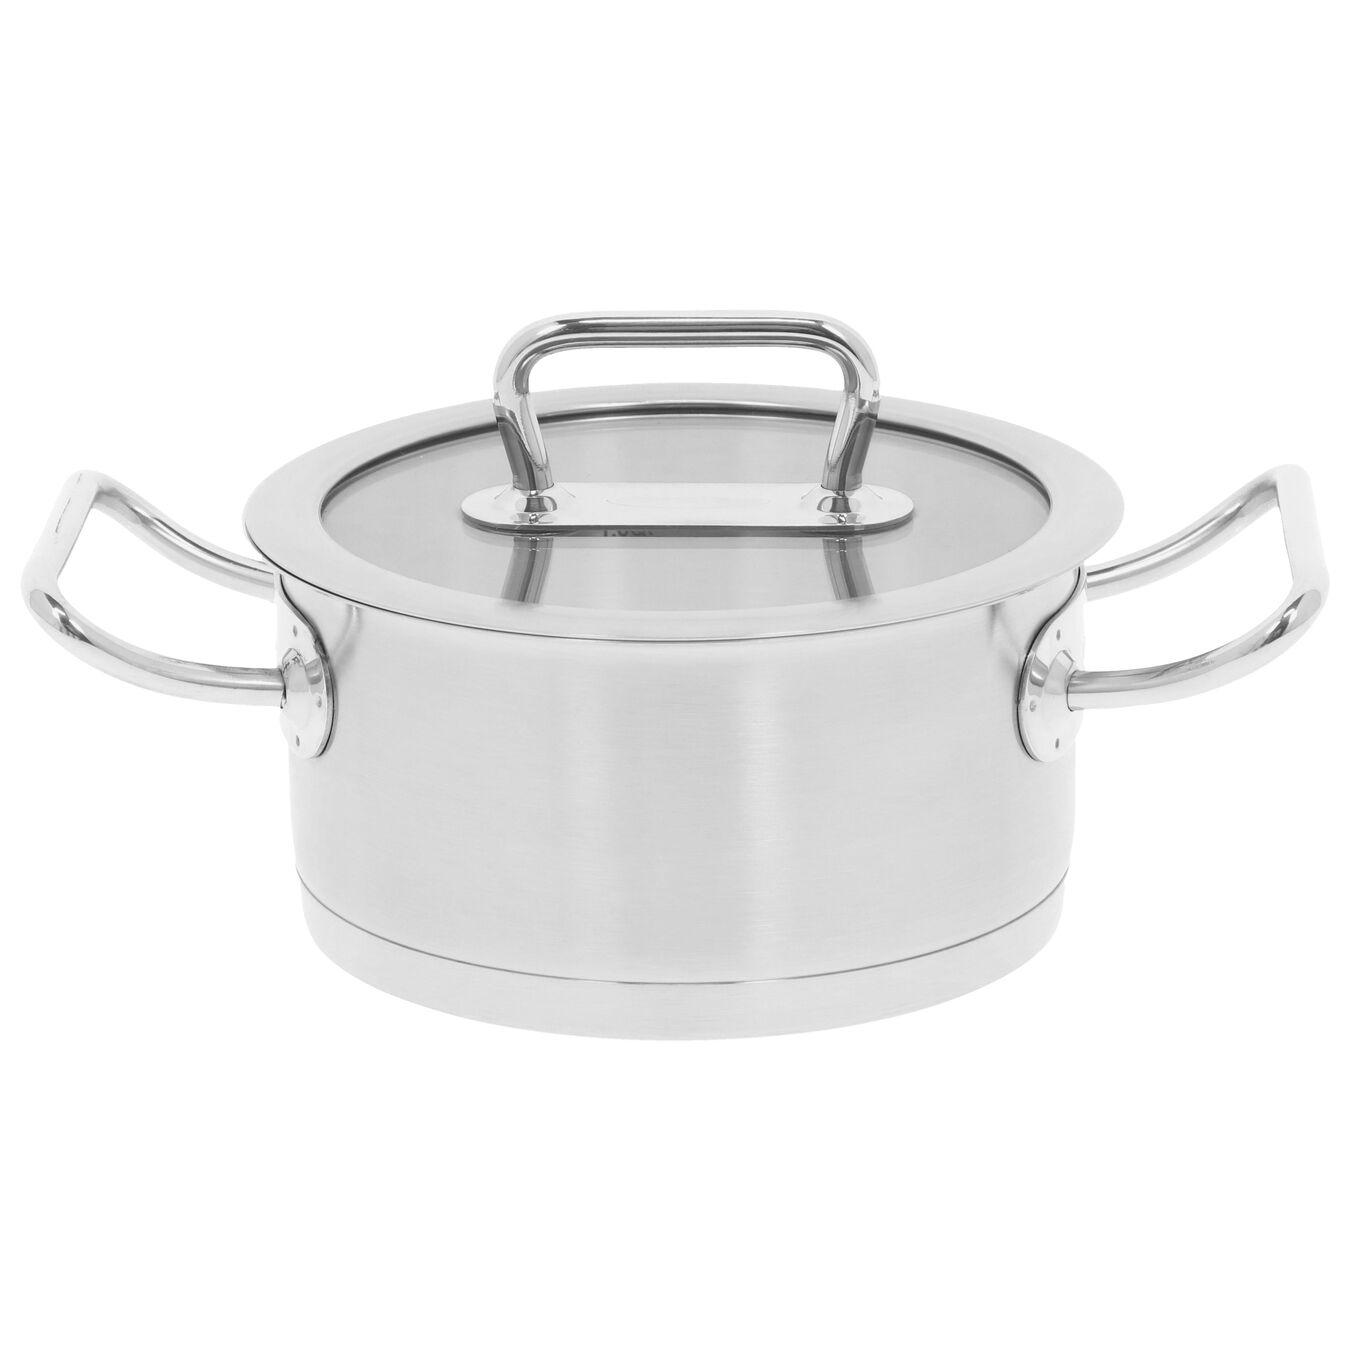 Kookpan met glazen deksel 24 cm / 5 l,,large 1